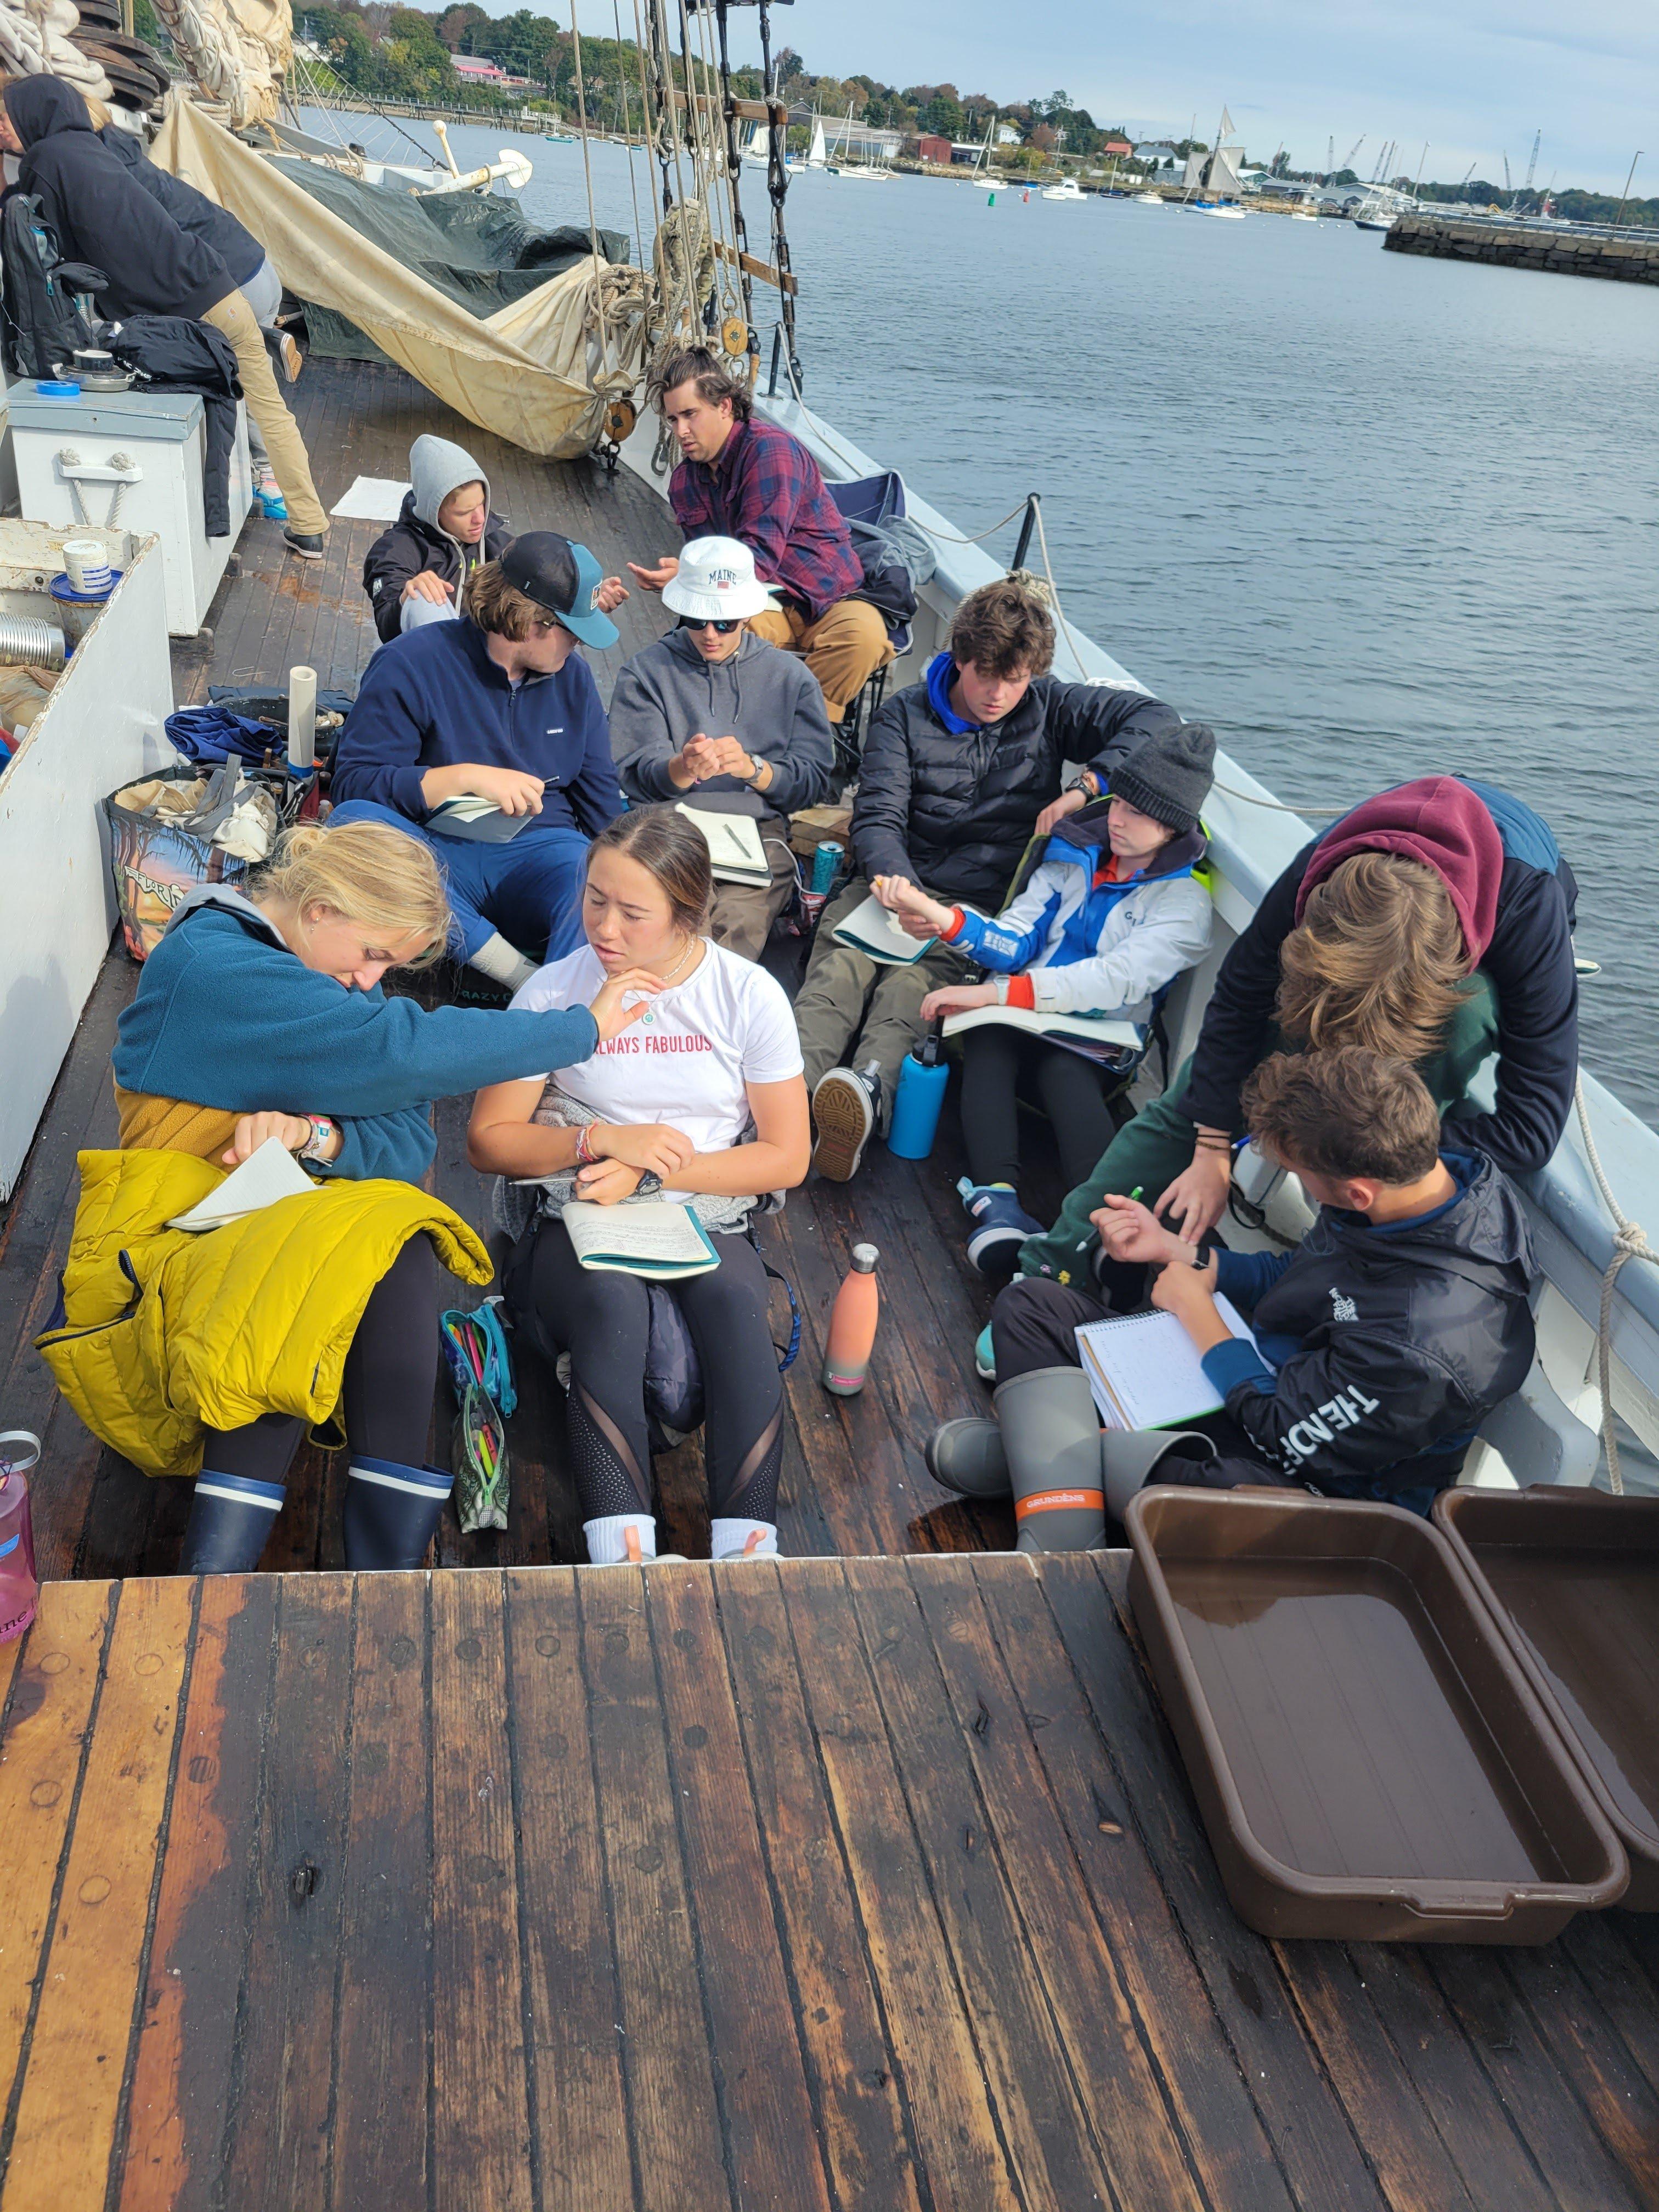 Proctor Academy Ocean Classroom Sailing Ships Maine